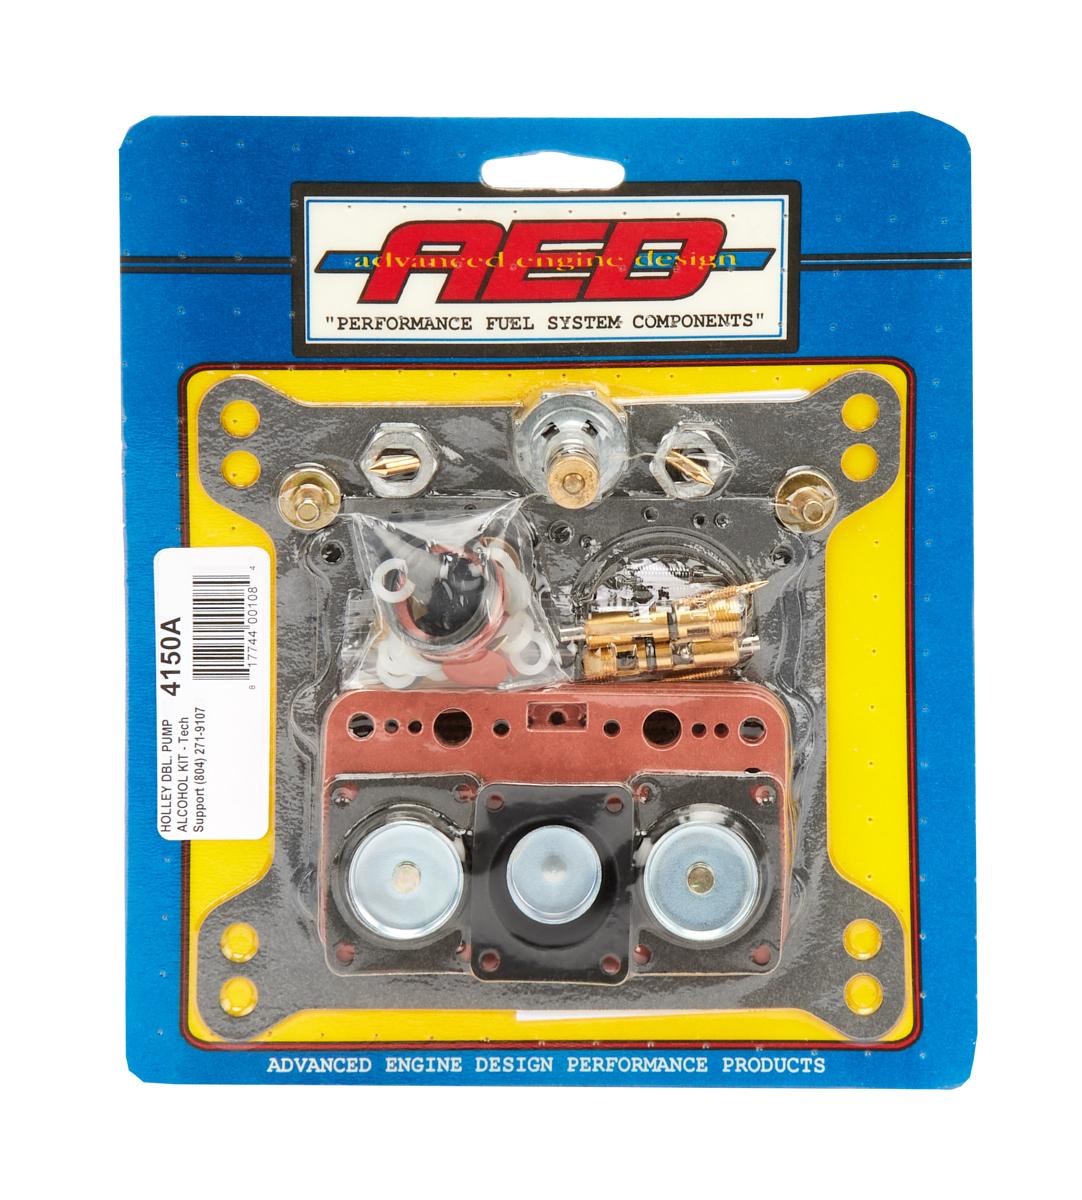 AED Performance 4150A Carburetor Rebuild Kit, Performance Alky, Holley 4150 Carburetors, Gas / Alcohol, Kit